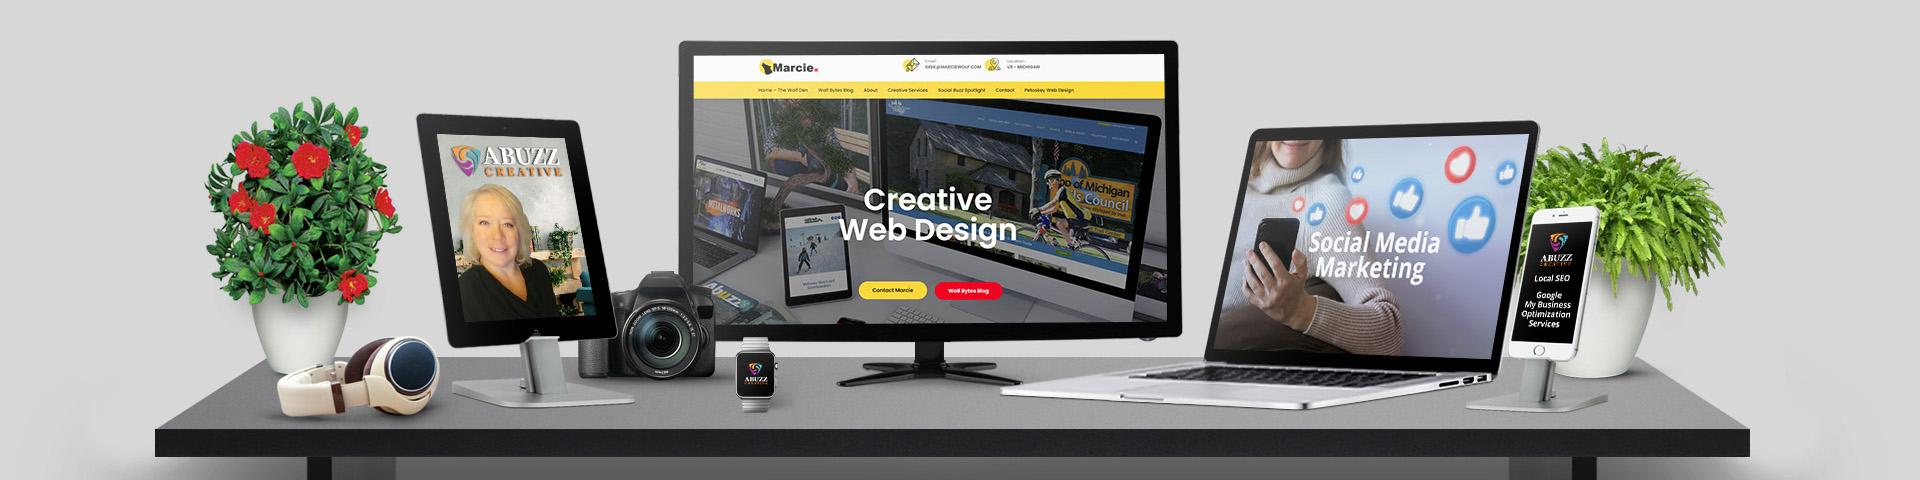 Abuzz Creative Web Design Northern Michigan Marcie Wolf